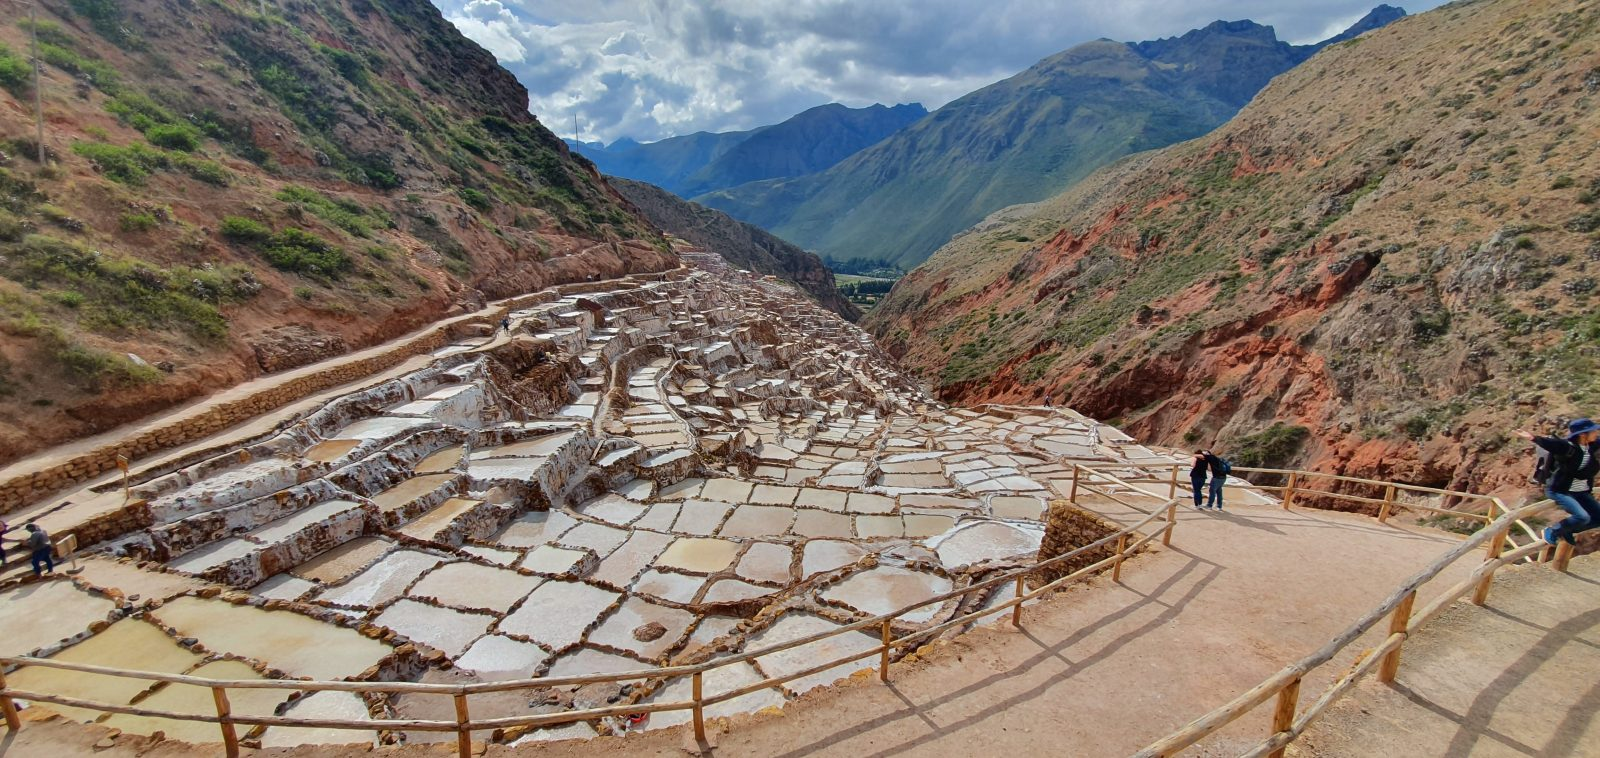 Picture of the Mara Salt Mines